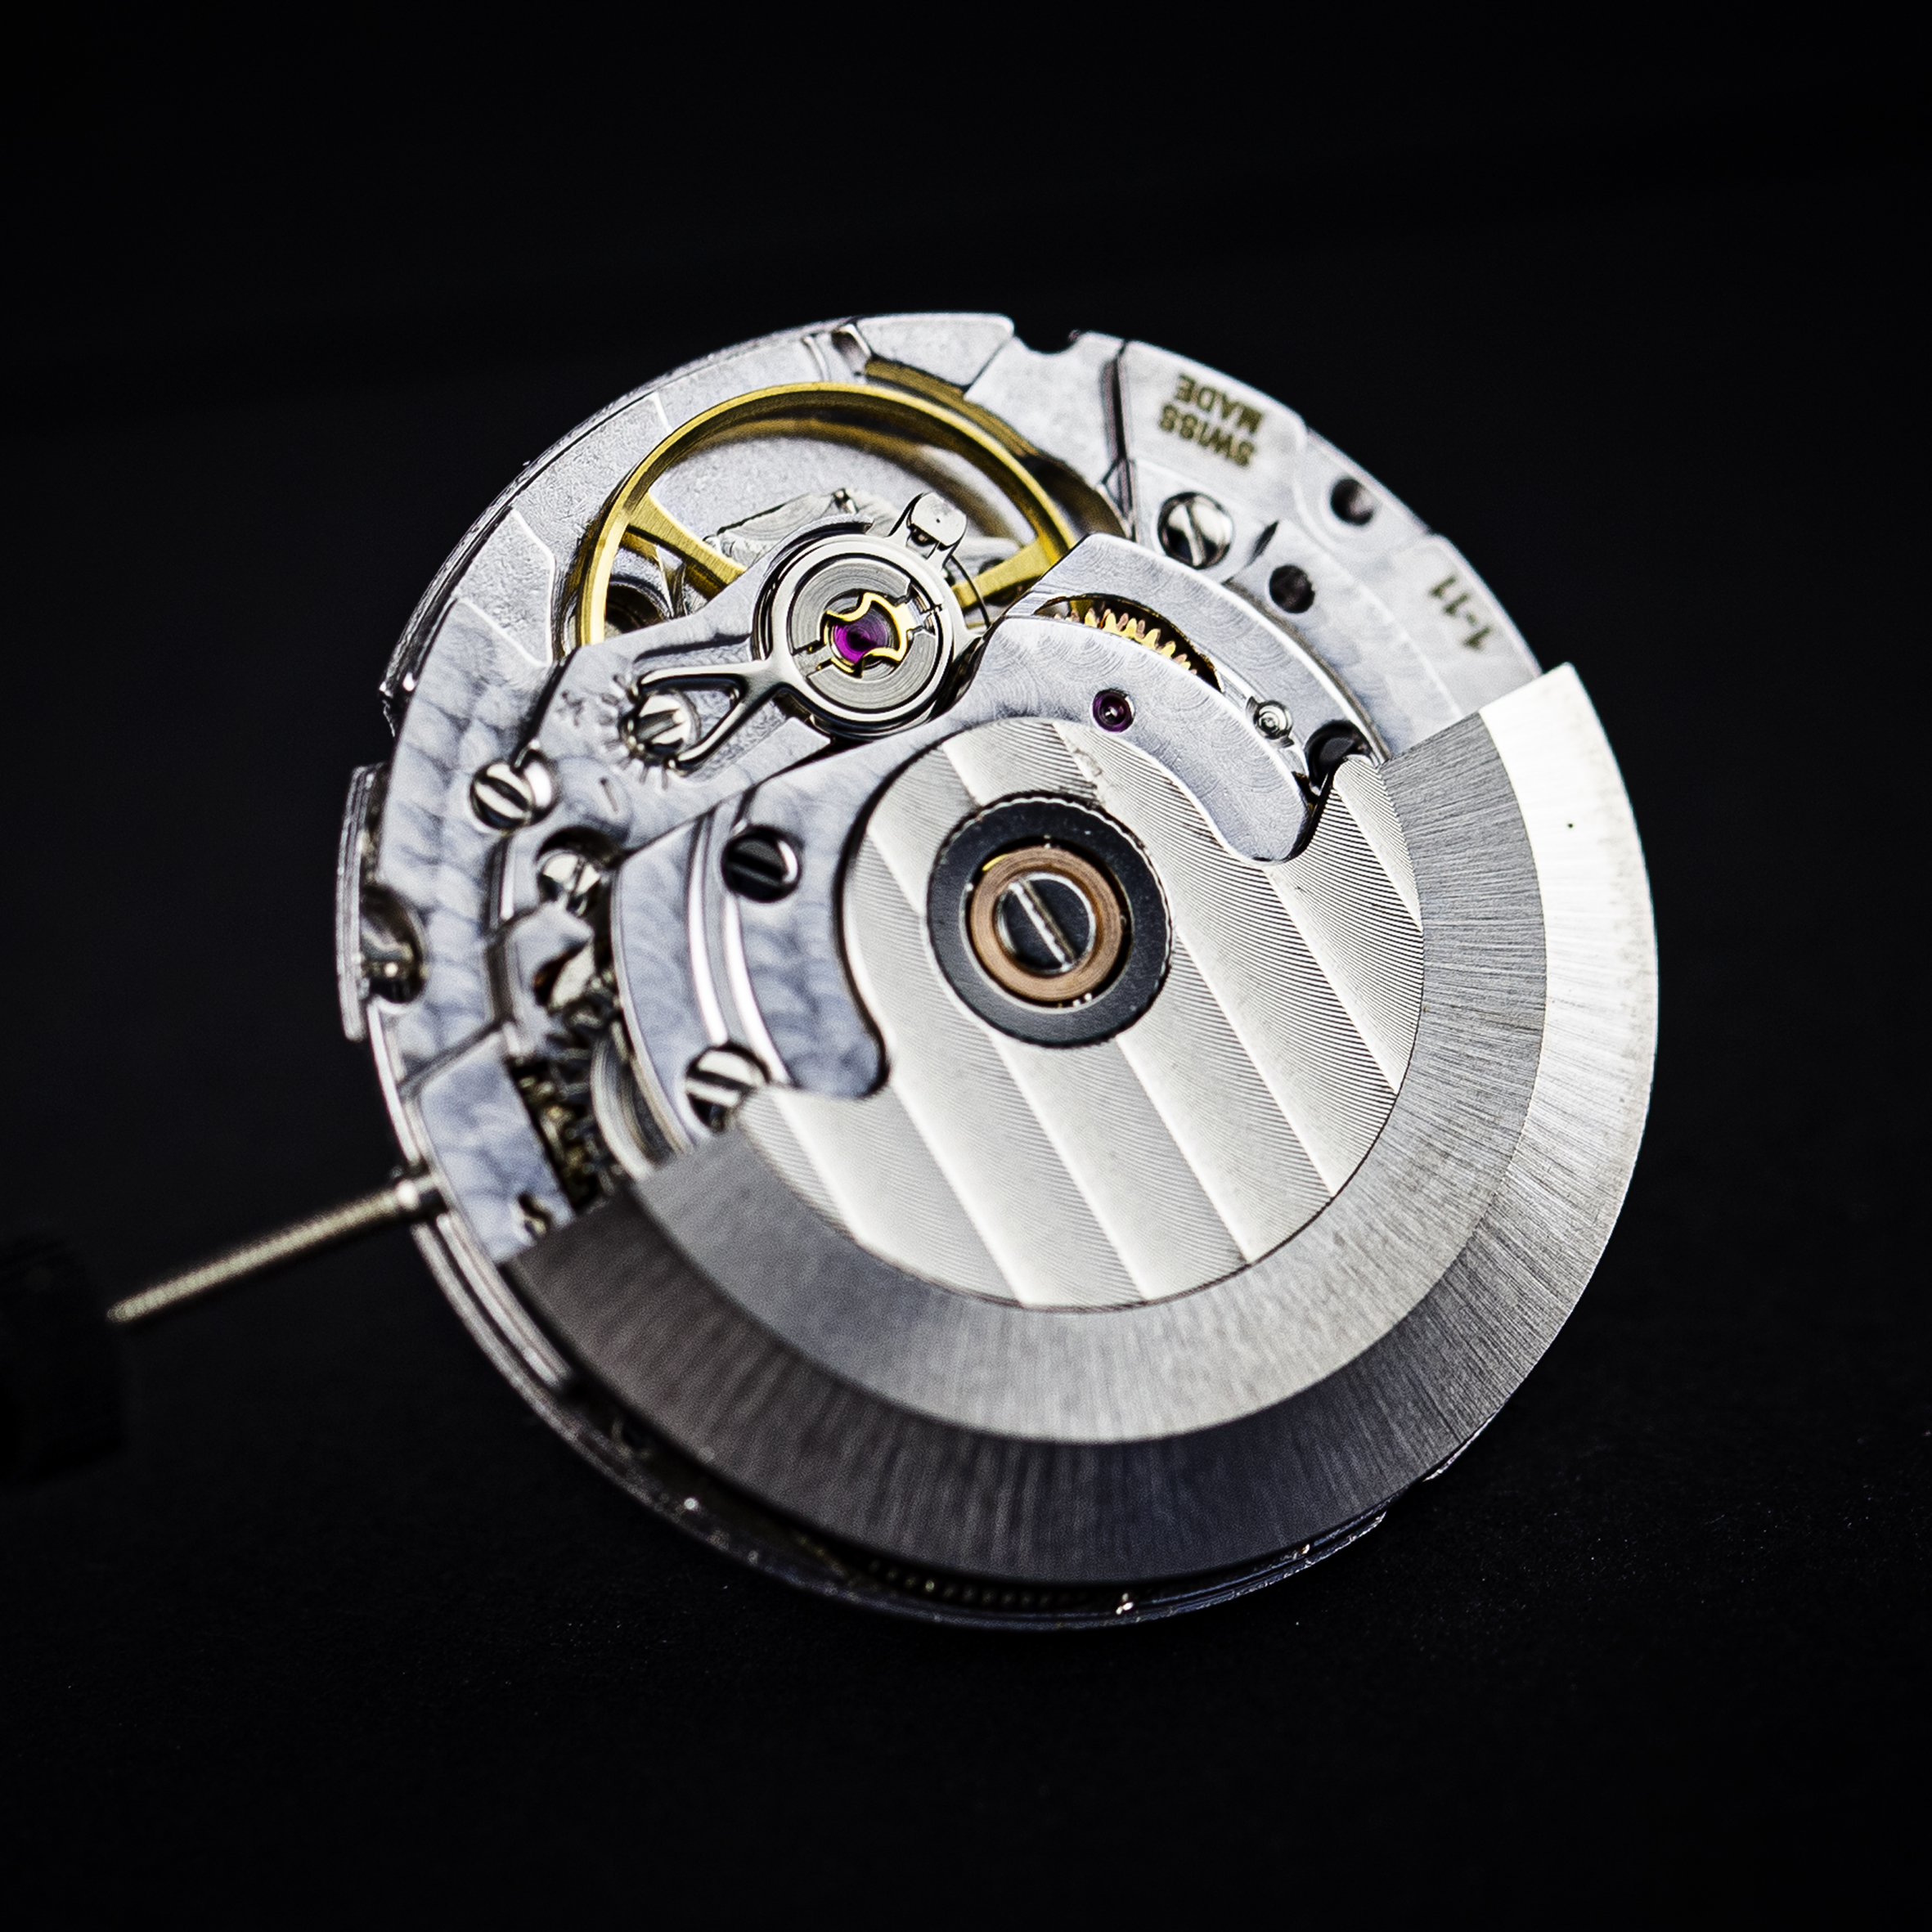 Contattaci / contact us - Importime Watches - Produttori orologi